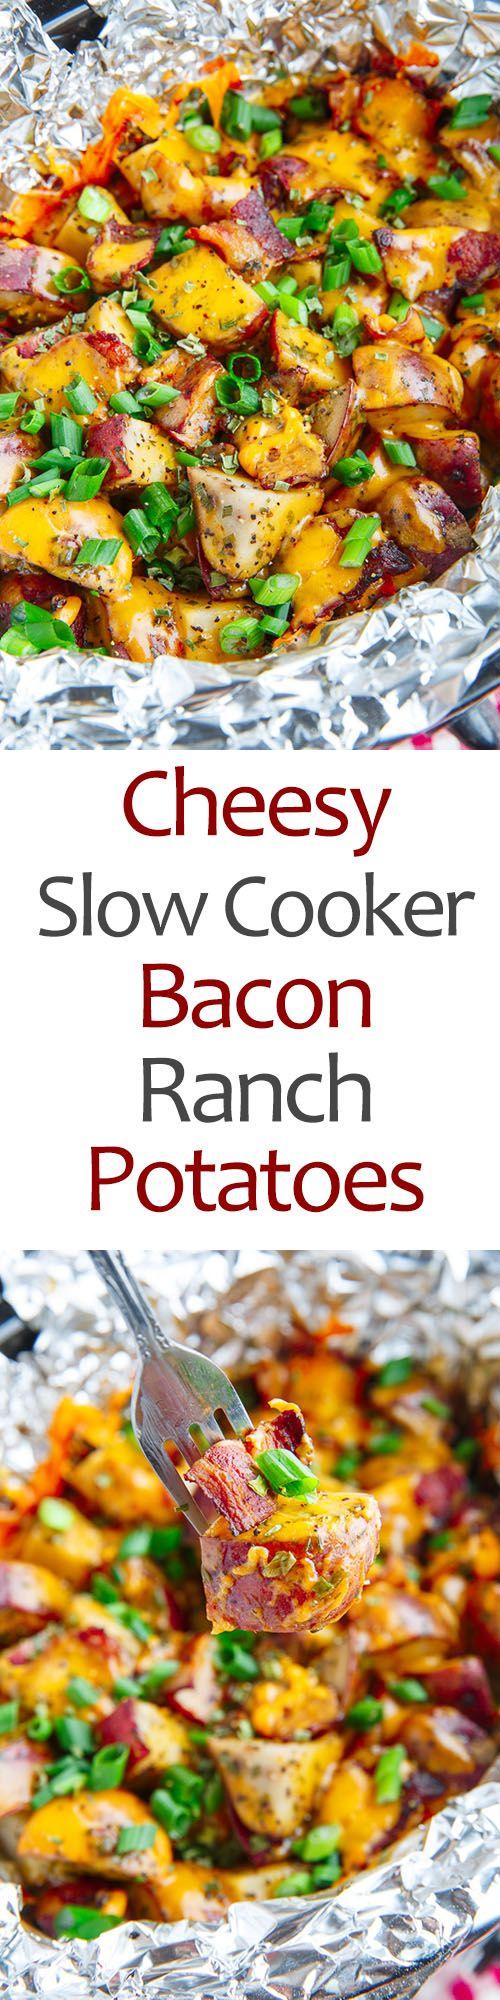 Cheesy Slow Cooker Bacon Ranch Potatoes